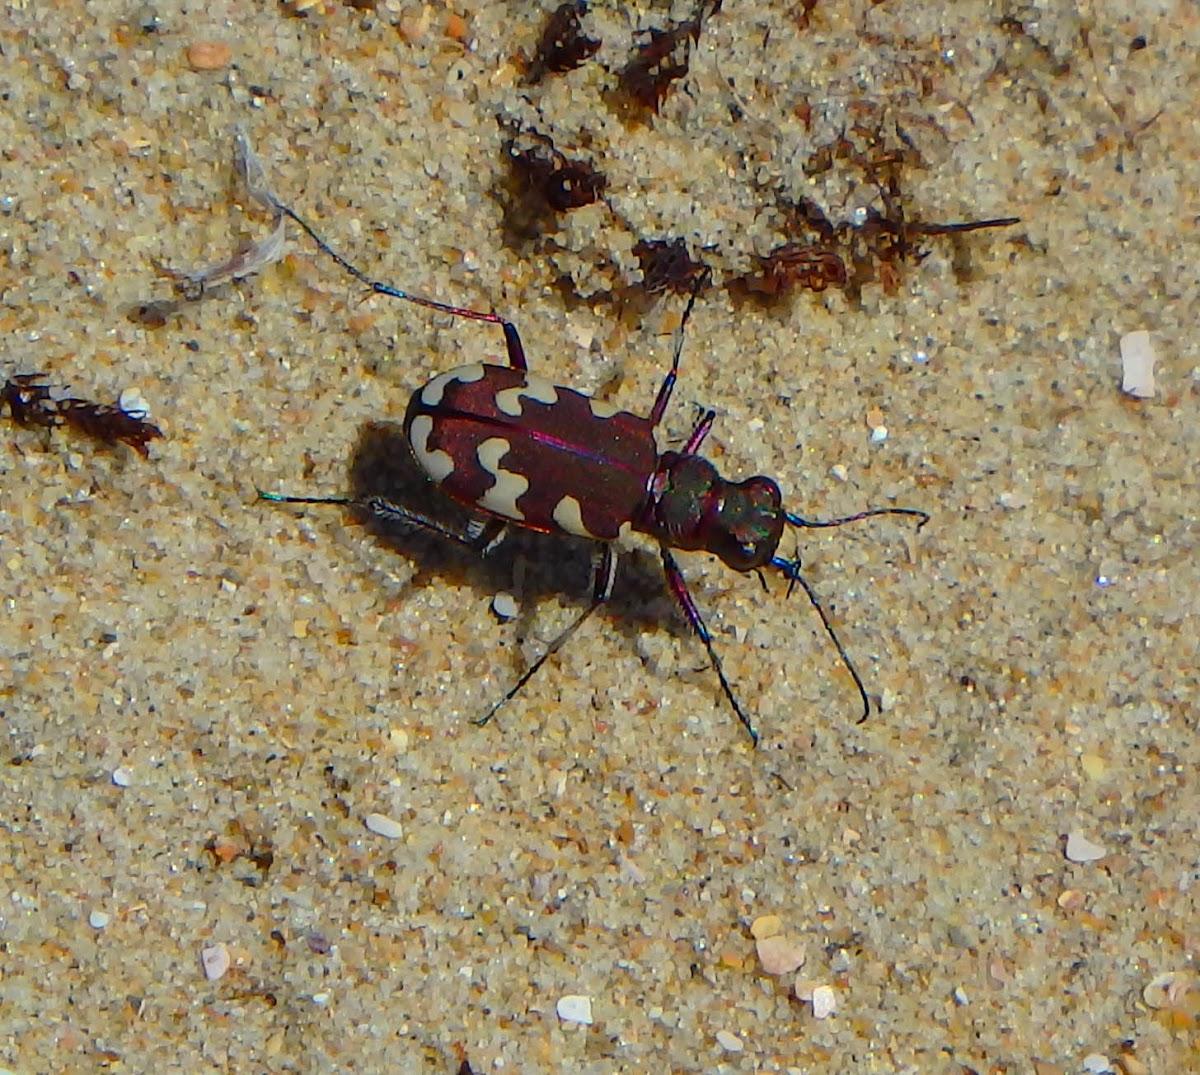 Dune tiger beetle